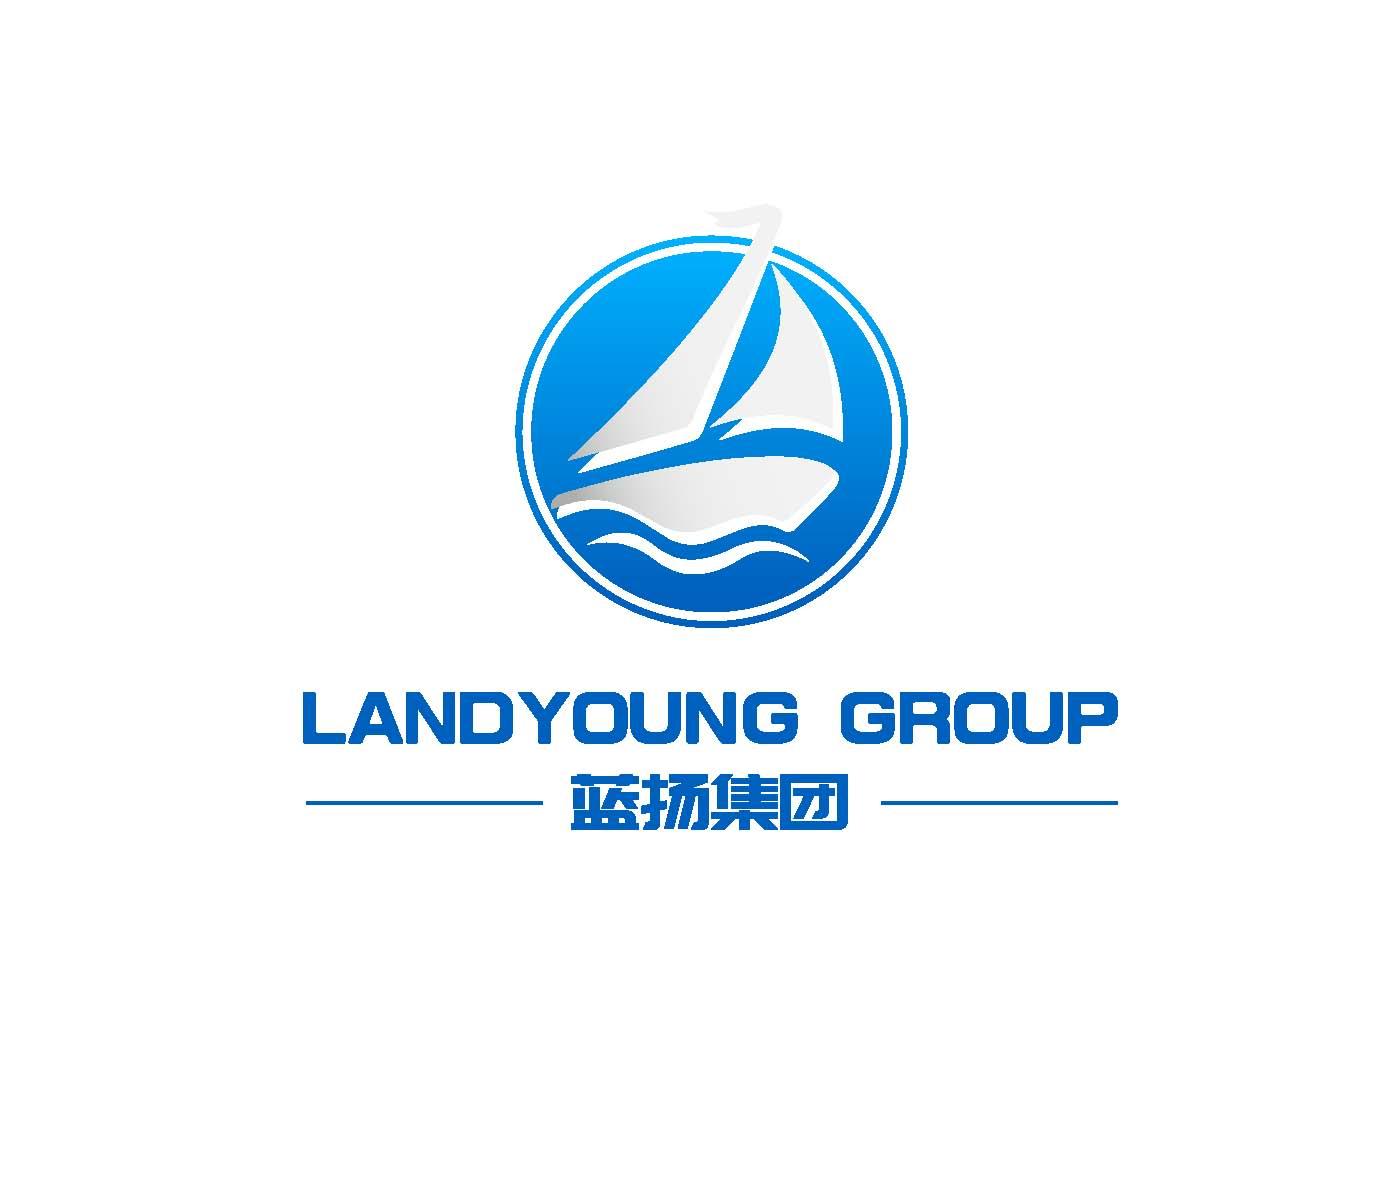 LANDYOUNG GROUP CO.,LTD.